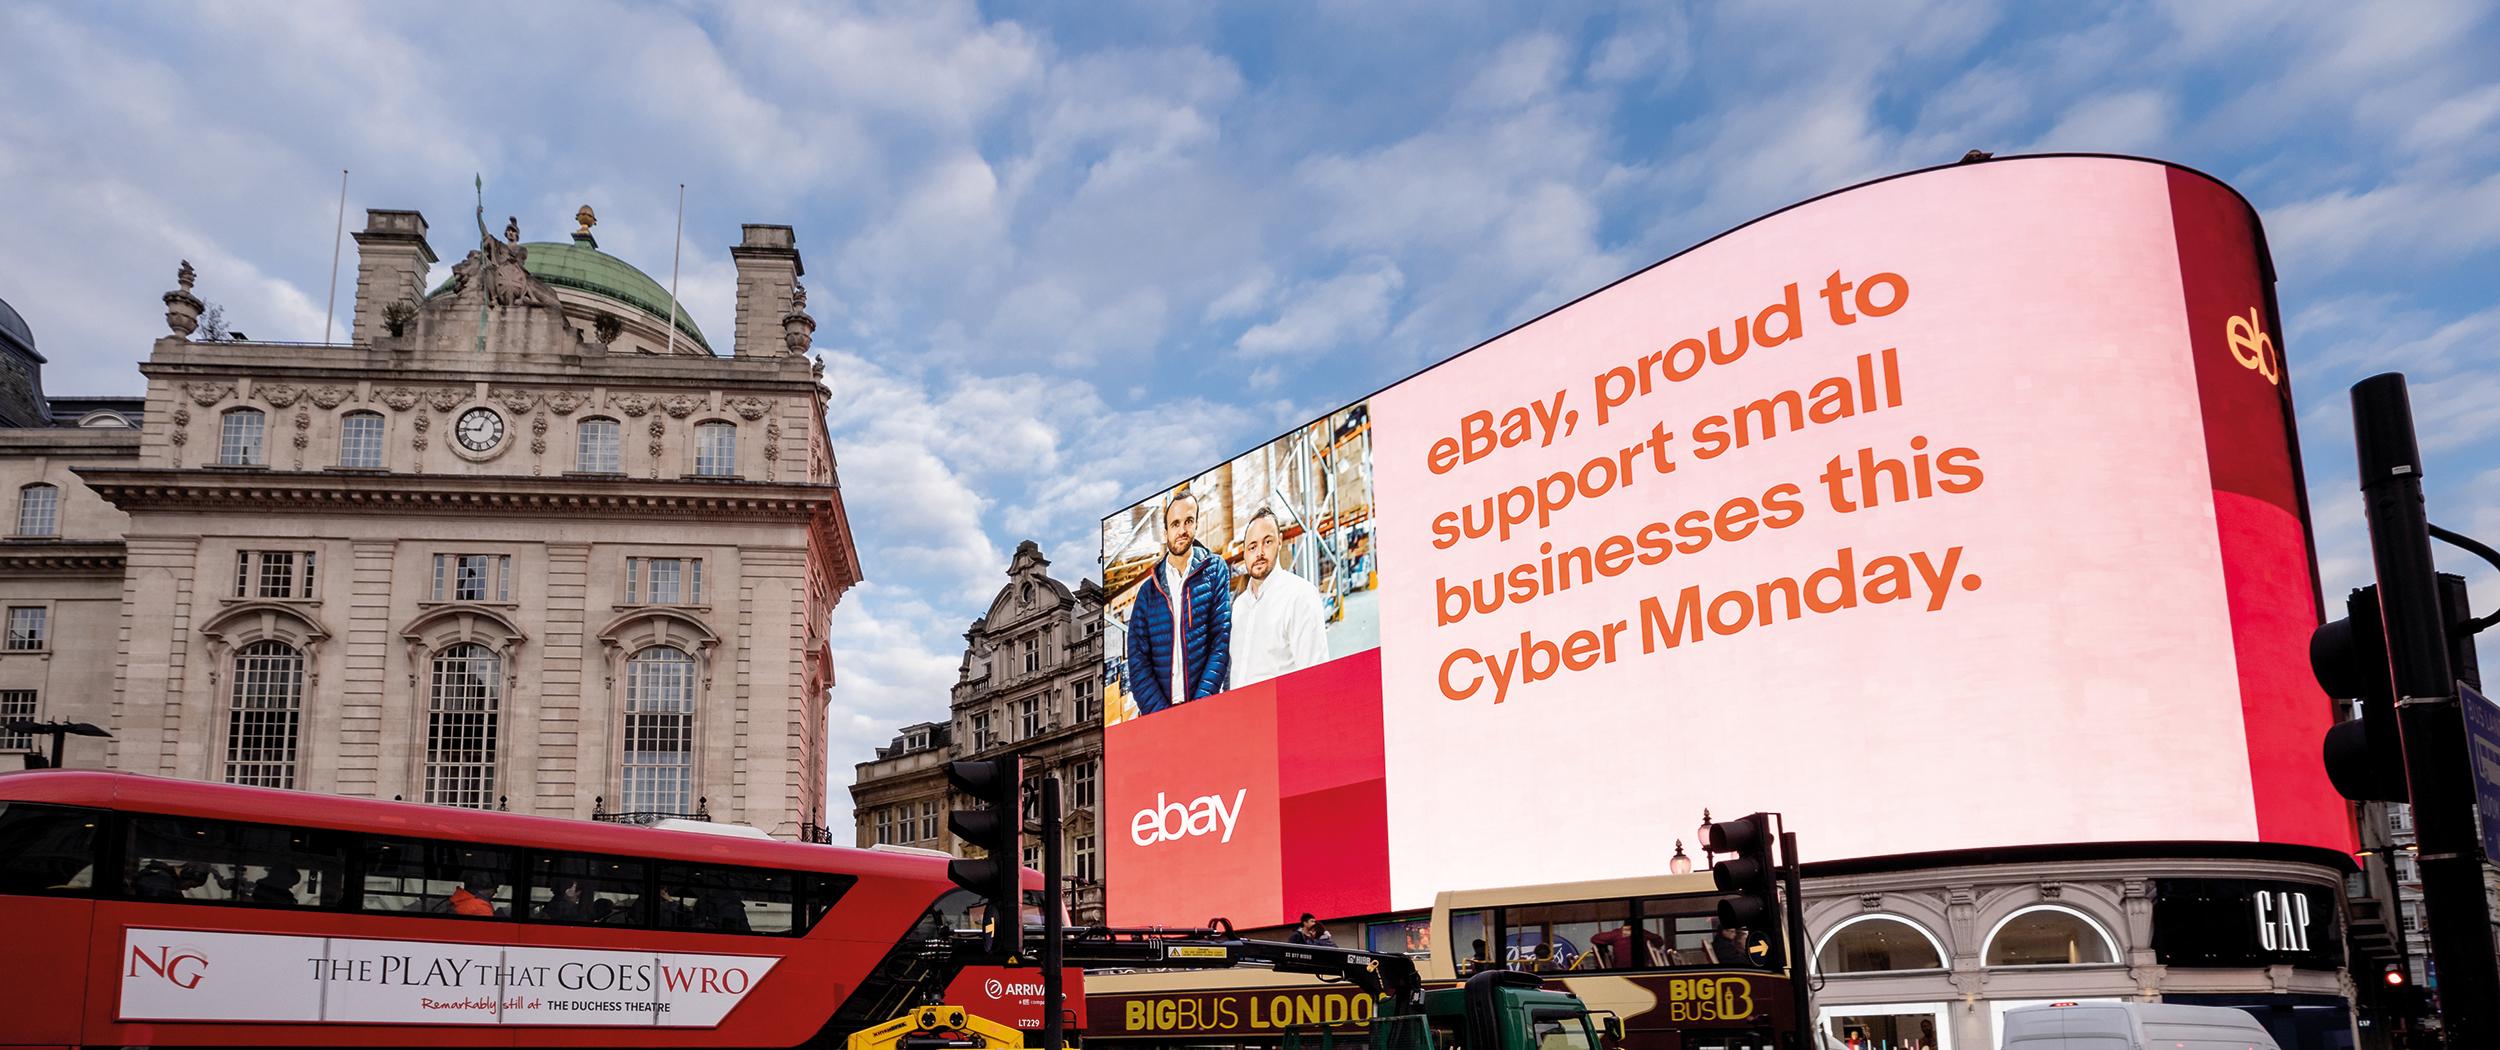 eBay_Cyber_Monday_2018_ATP_011_3266.jpg